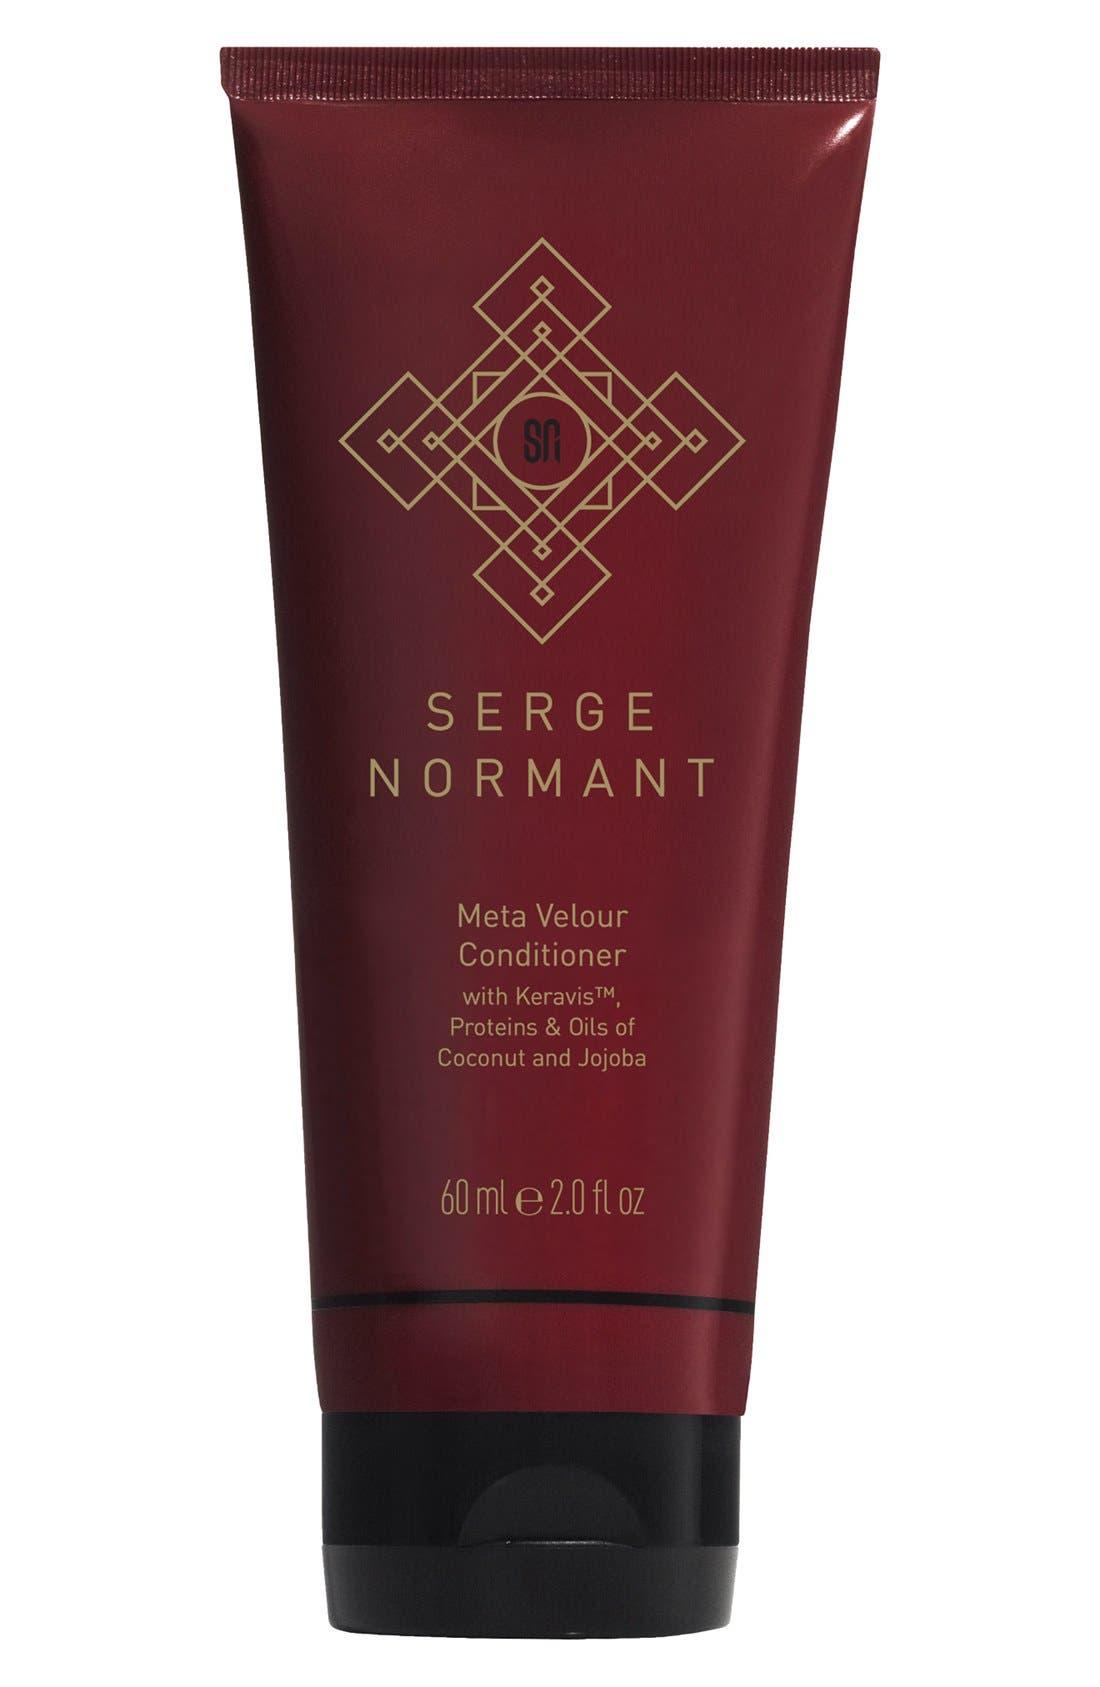 Serge Normant 'Meta Velour' Mini Conditioner